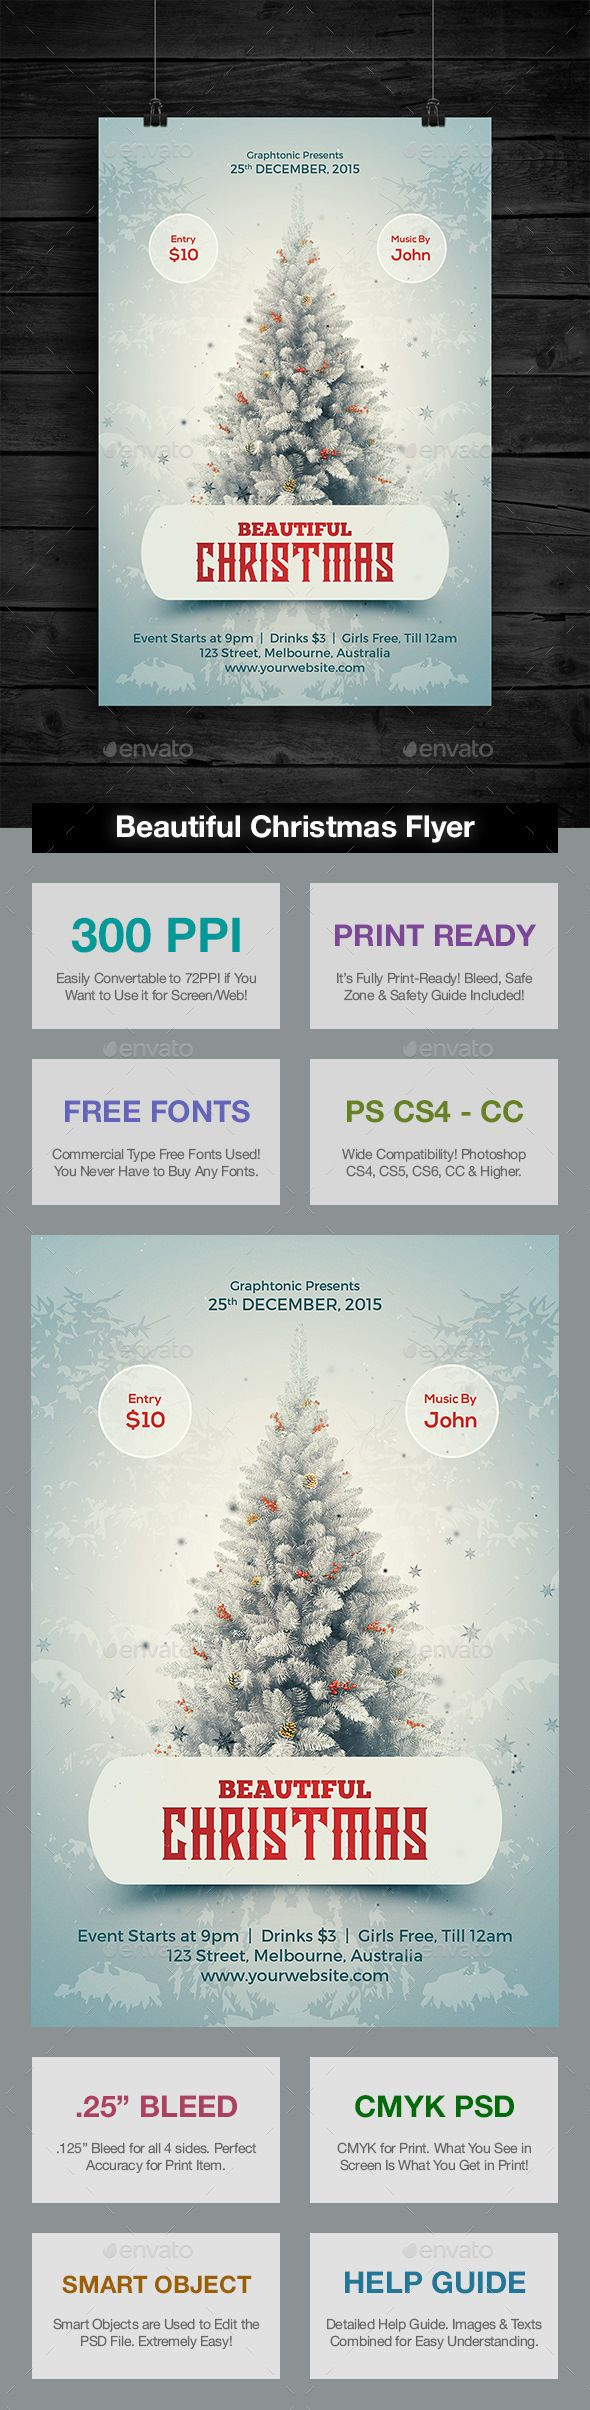 Beautiful Christmas #Flyer - Holidays #Events #Christmas #NewYears #Seasons #Holidays #Winter #Graphics #Design #Xmas